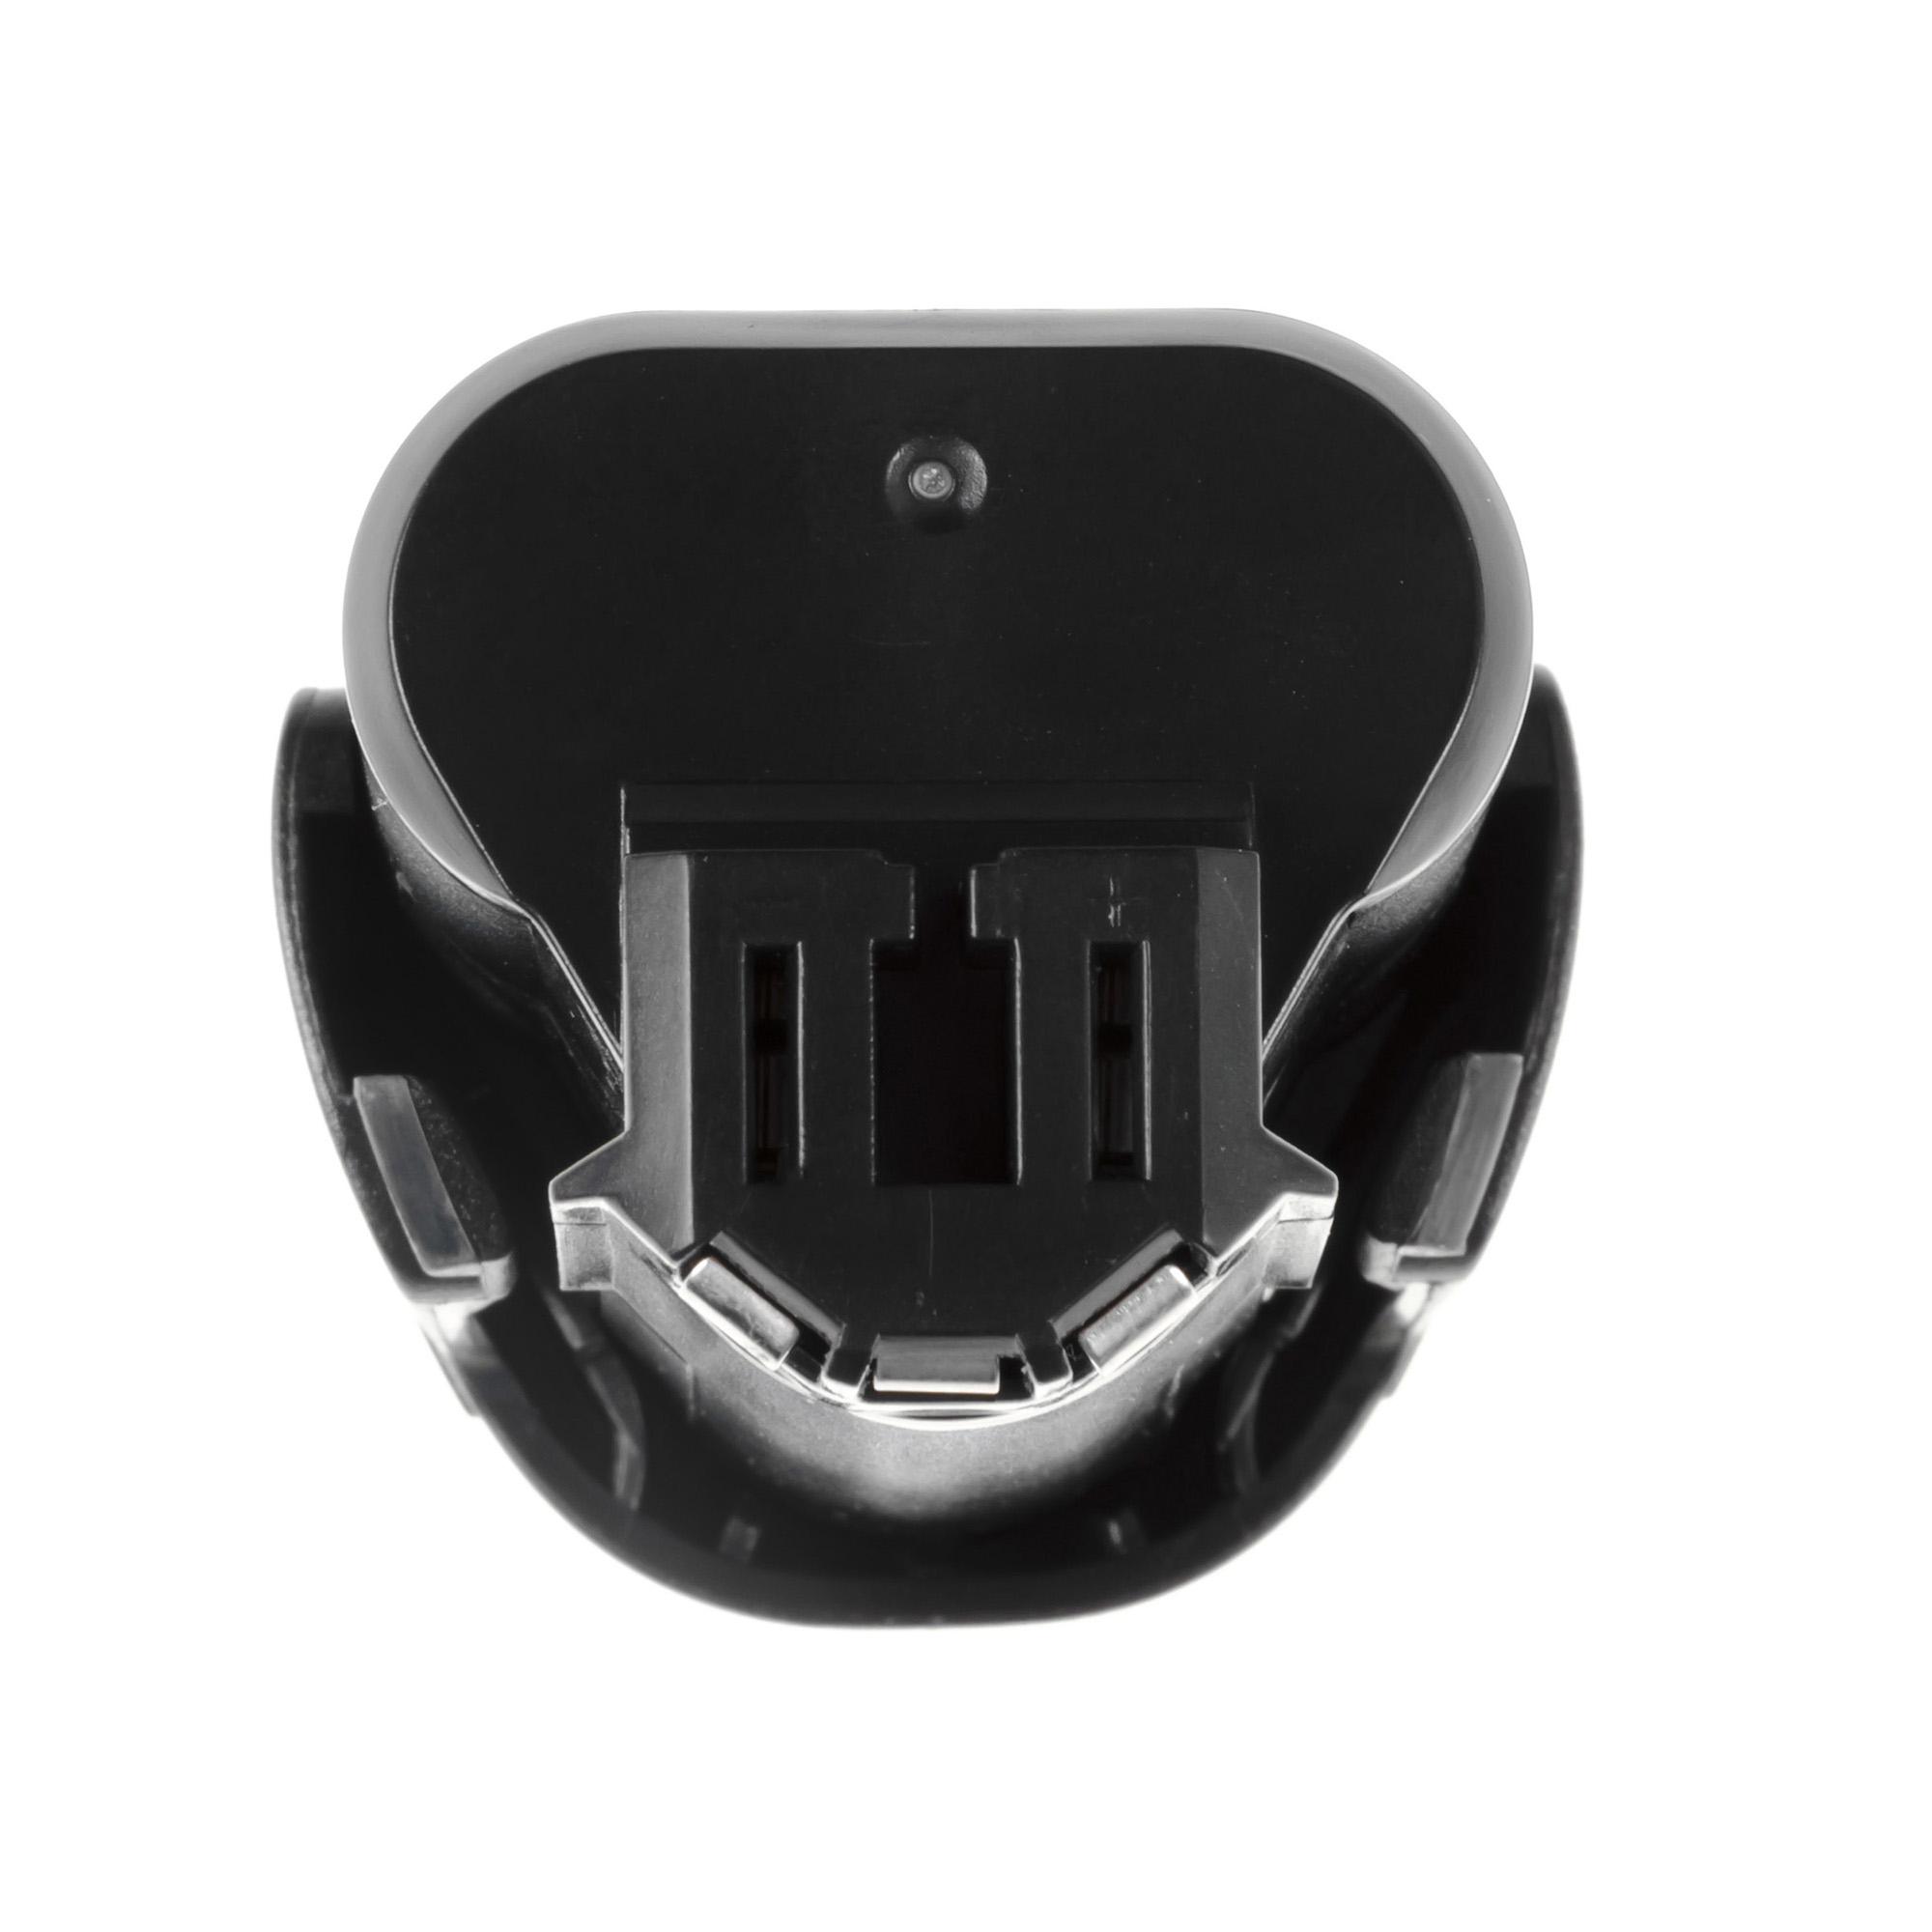 power tool cordless battery for bosch psr 10 8 li 2 1. Black Bedroom Furniture Sets. Home Design Ideas